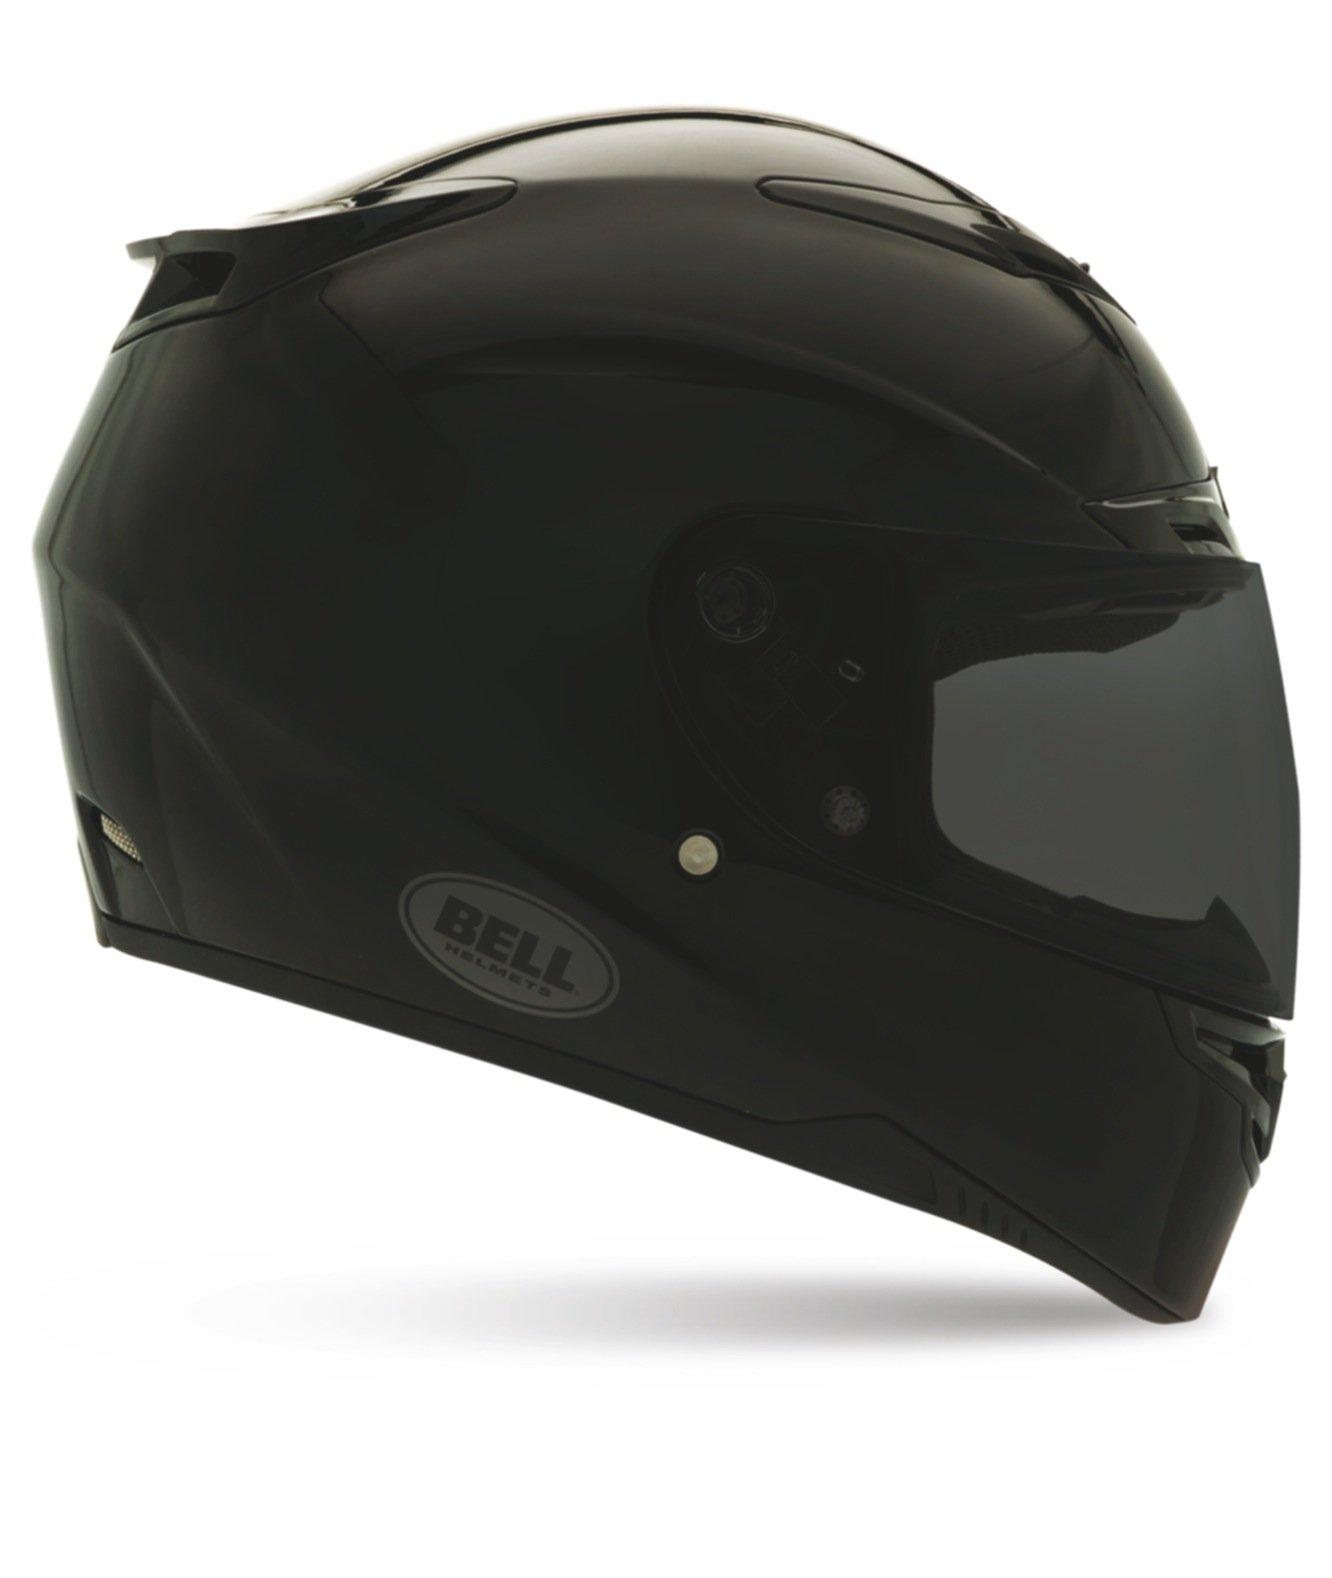 Bell RS-1 Motorcycle Helmet Transitions Visor